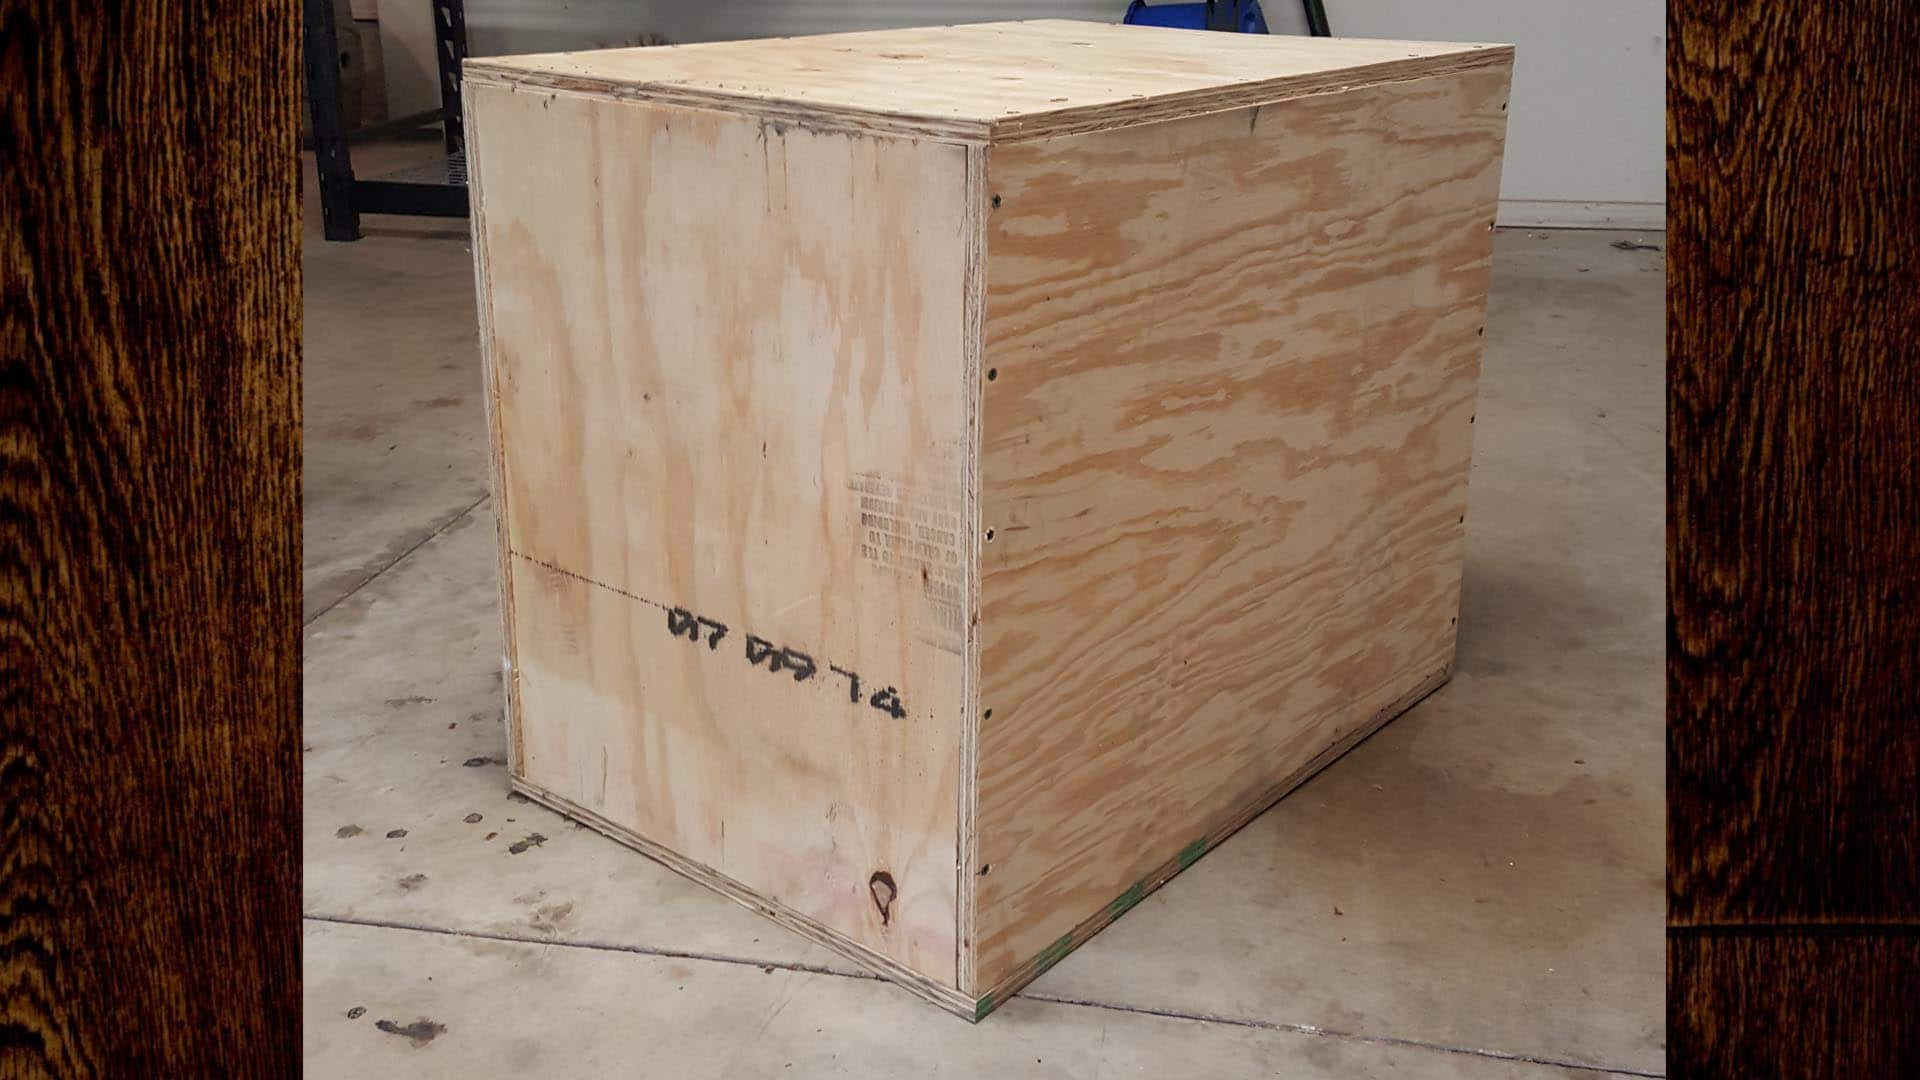 DIY Plyometric Box  How to Make a 3 in 1 Plyometric Box